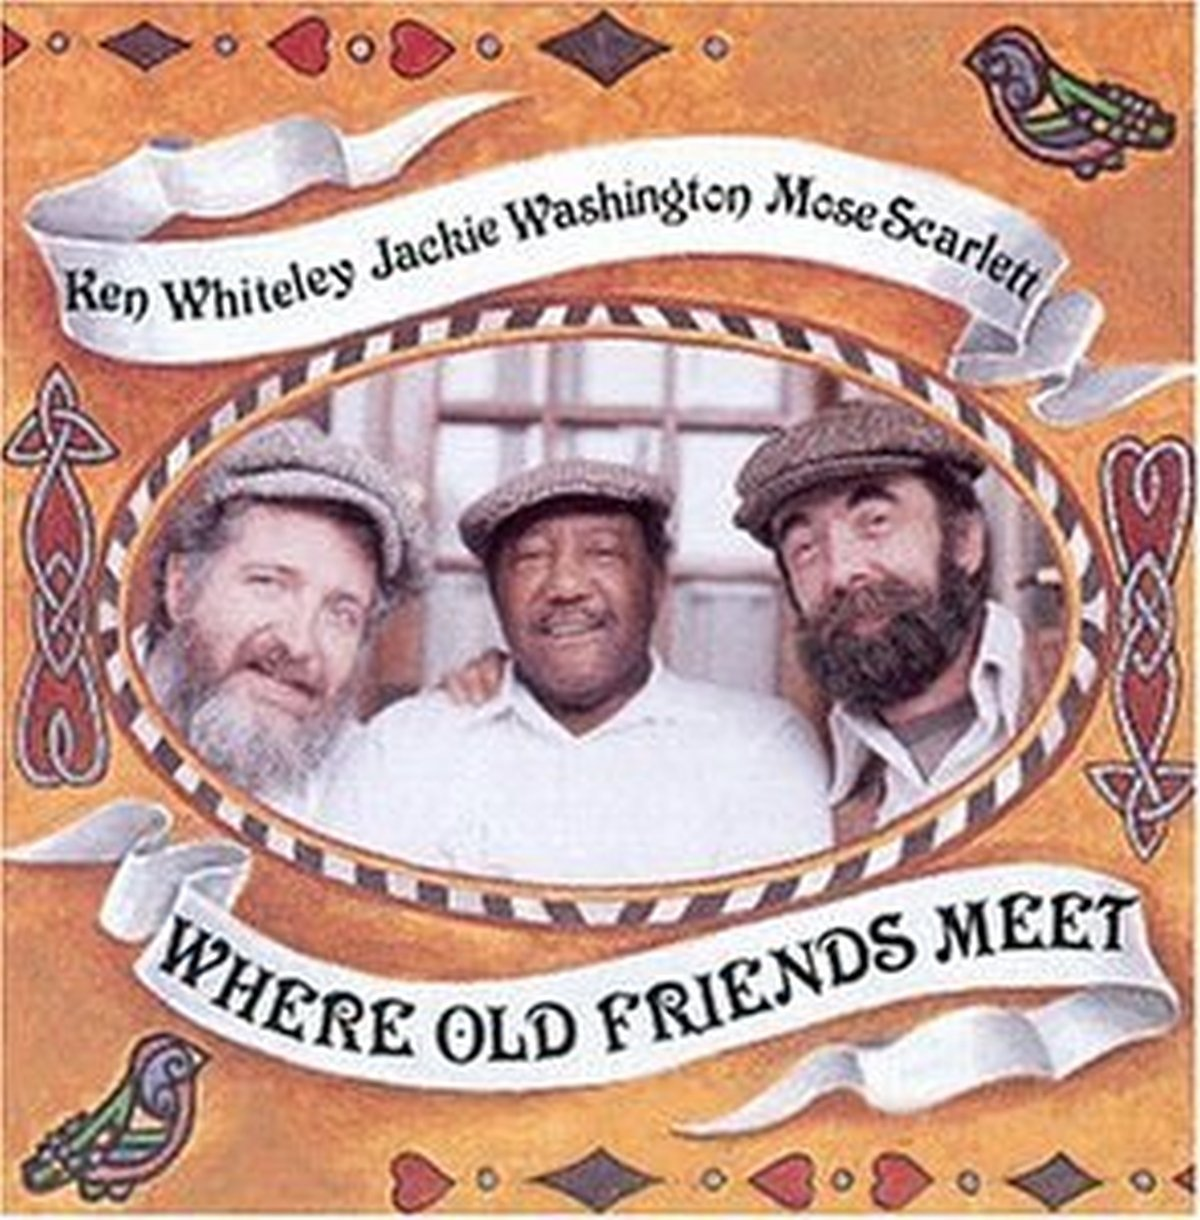 CD : Scarlett, Washington & Whiteley - Where Old Friends Meet (CD)